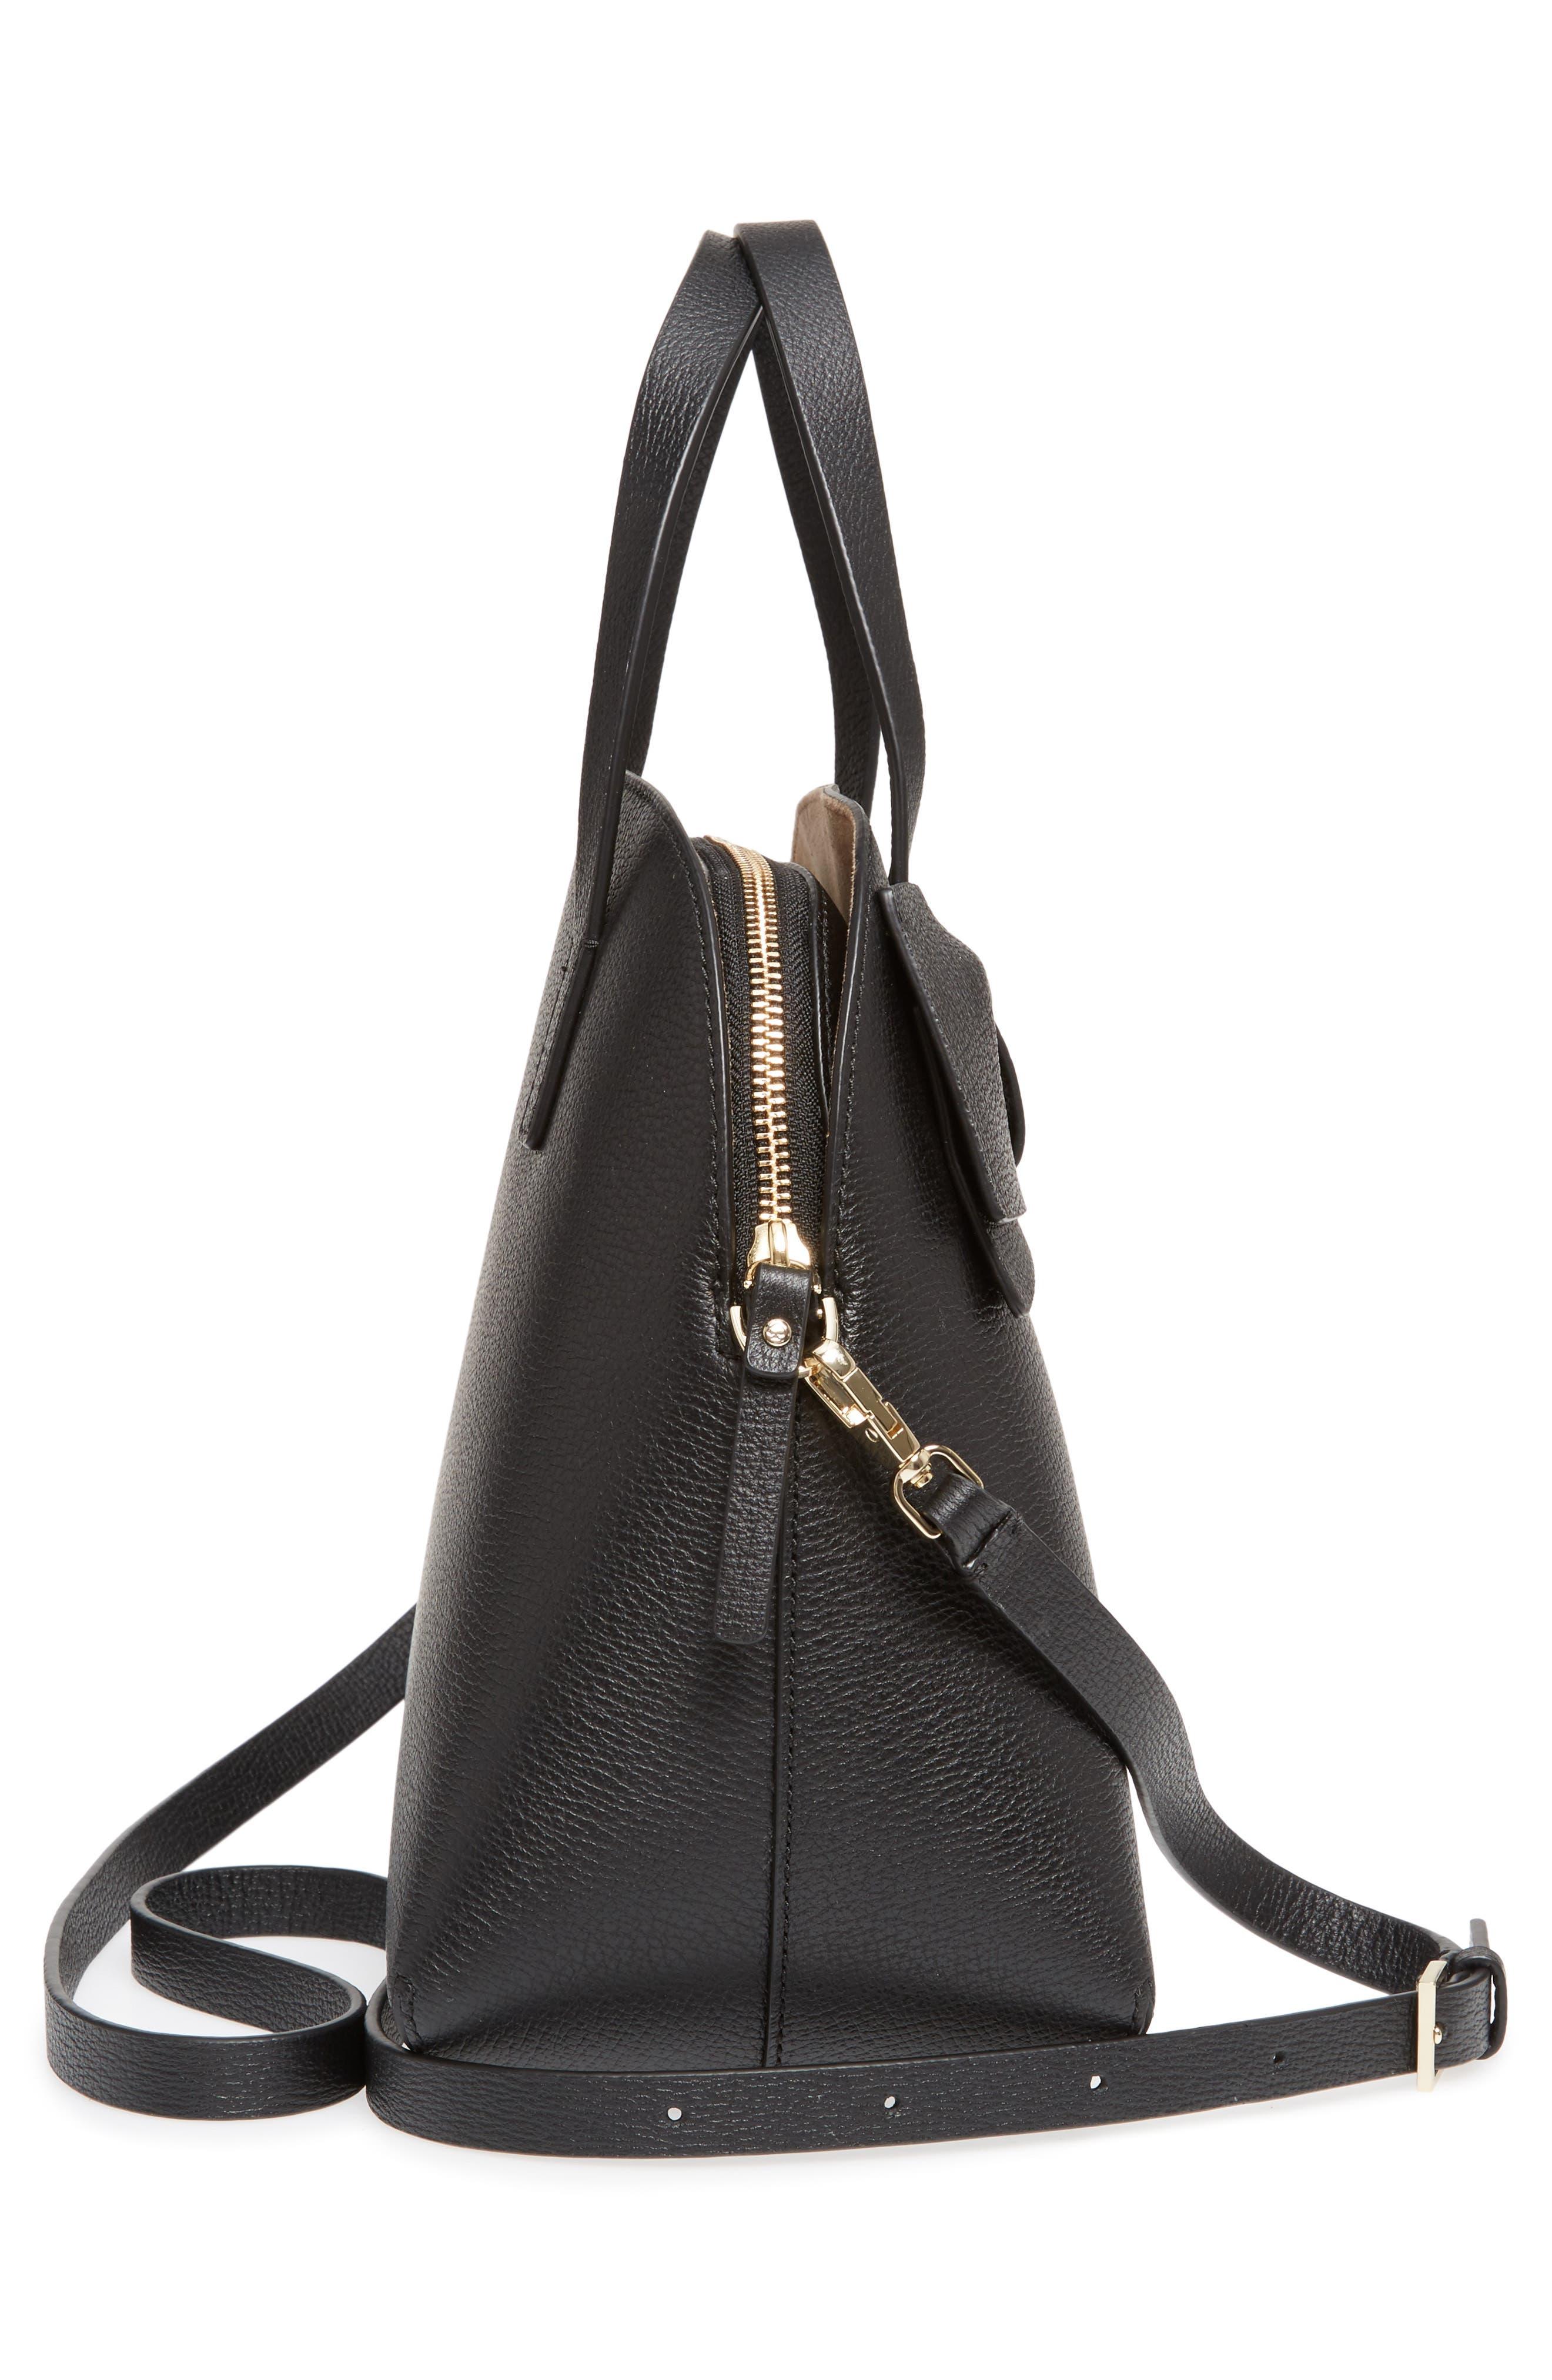 KATE SPADE NEW YORK,                             olive drive lottie leather satchel,                             Alternate thumbnail 5, color,                             001